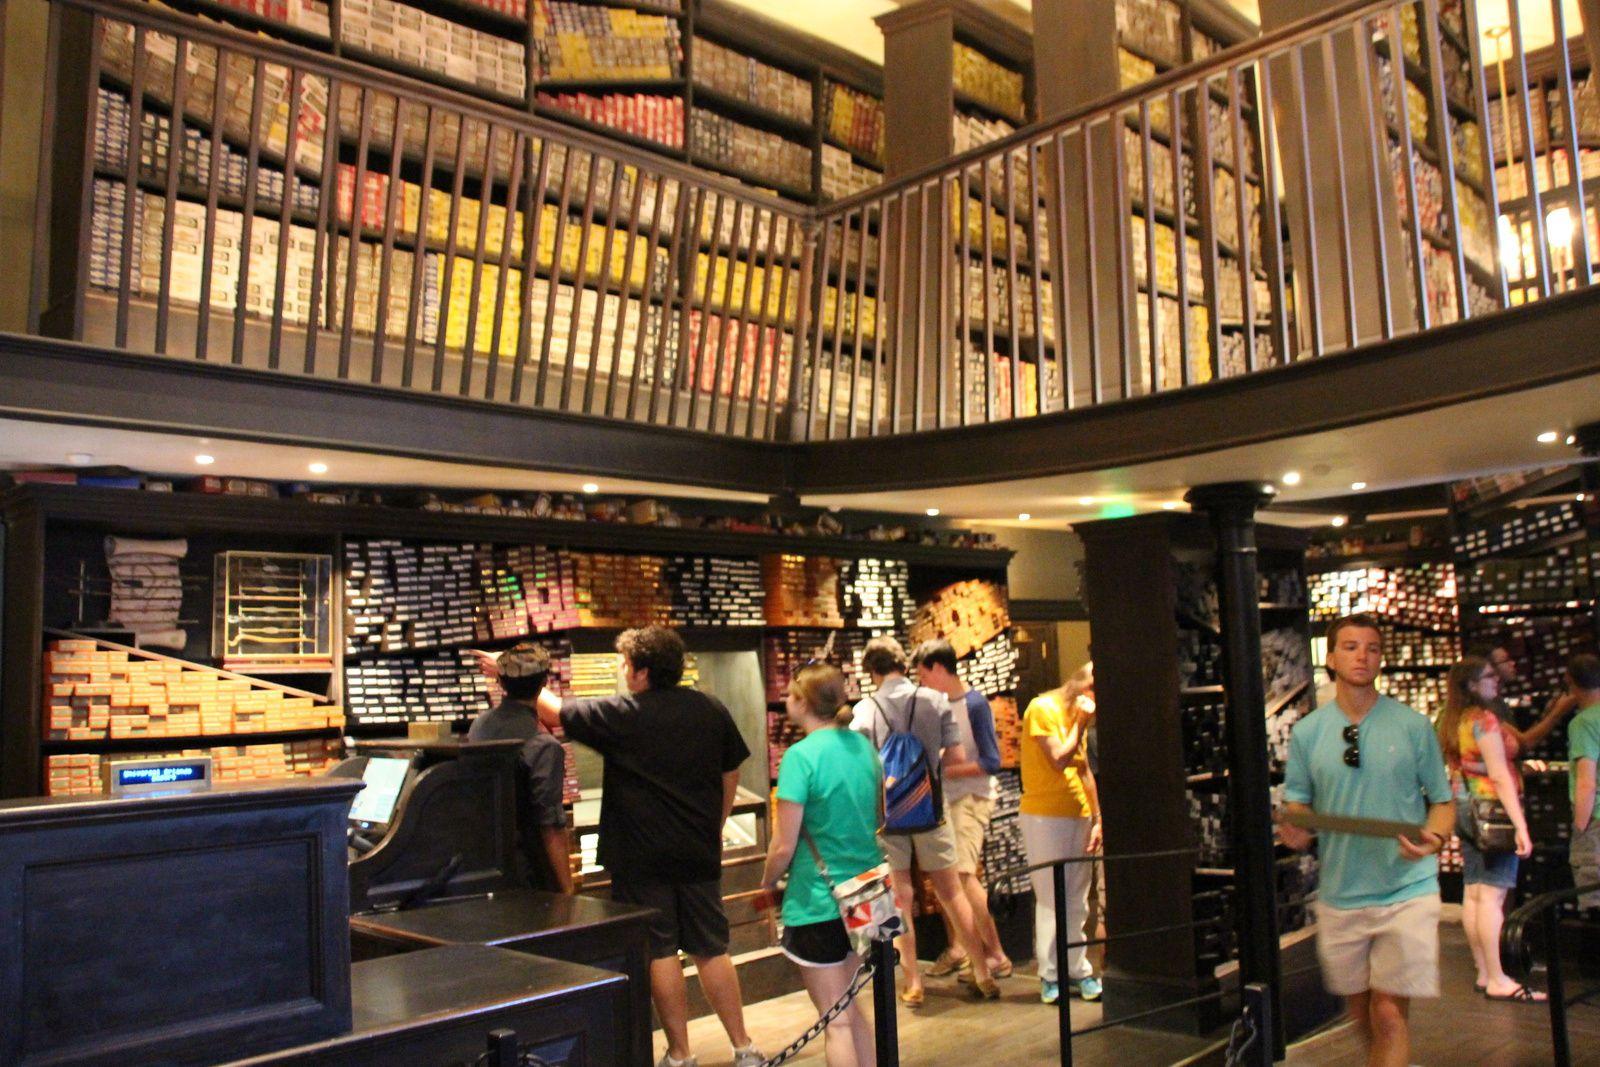 Ollivanders : The Wizarding World of Harry Potter